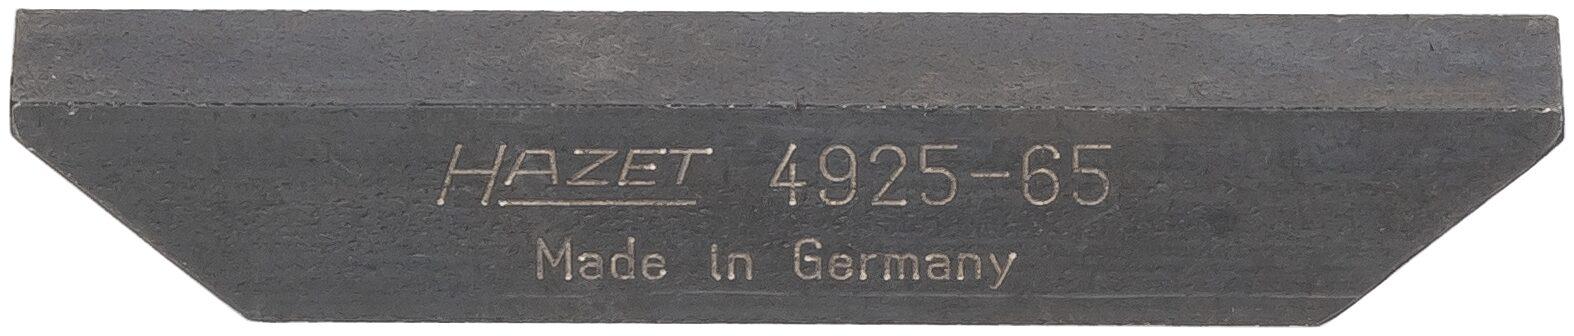 HAZET Metallkeil 4925-65